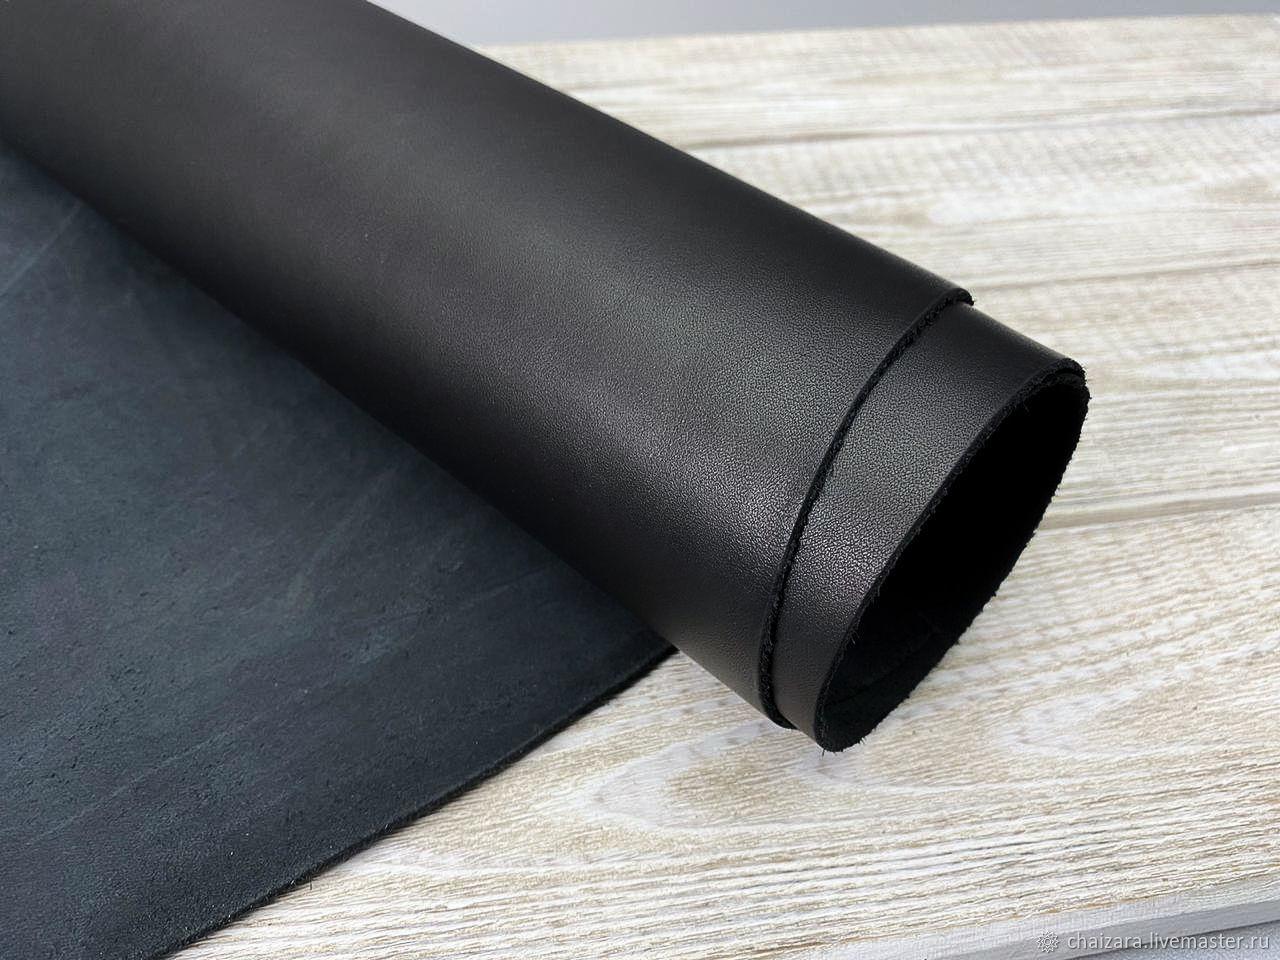 Натуральная кожа 1.4-1.6 мм Black-3, Кожа, Оренбург,  Фото №1